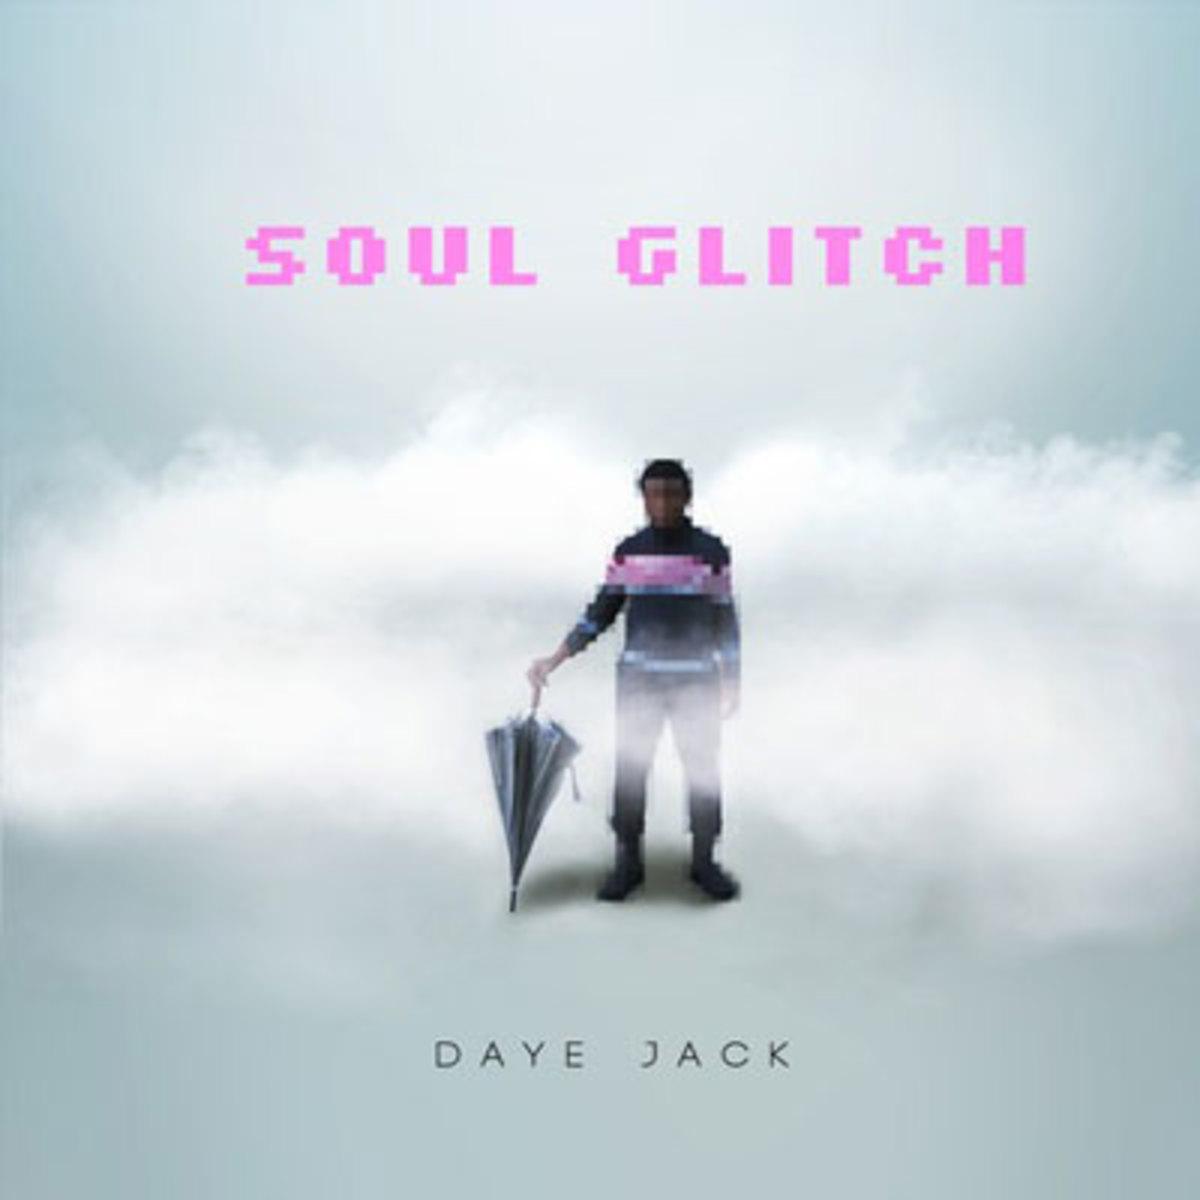 dayejack-soulglitch.jpg